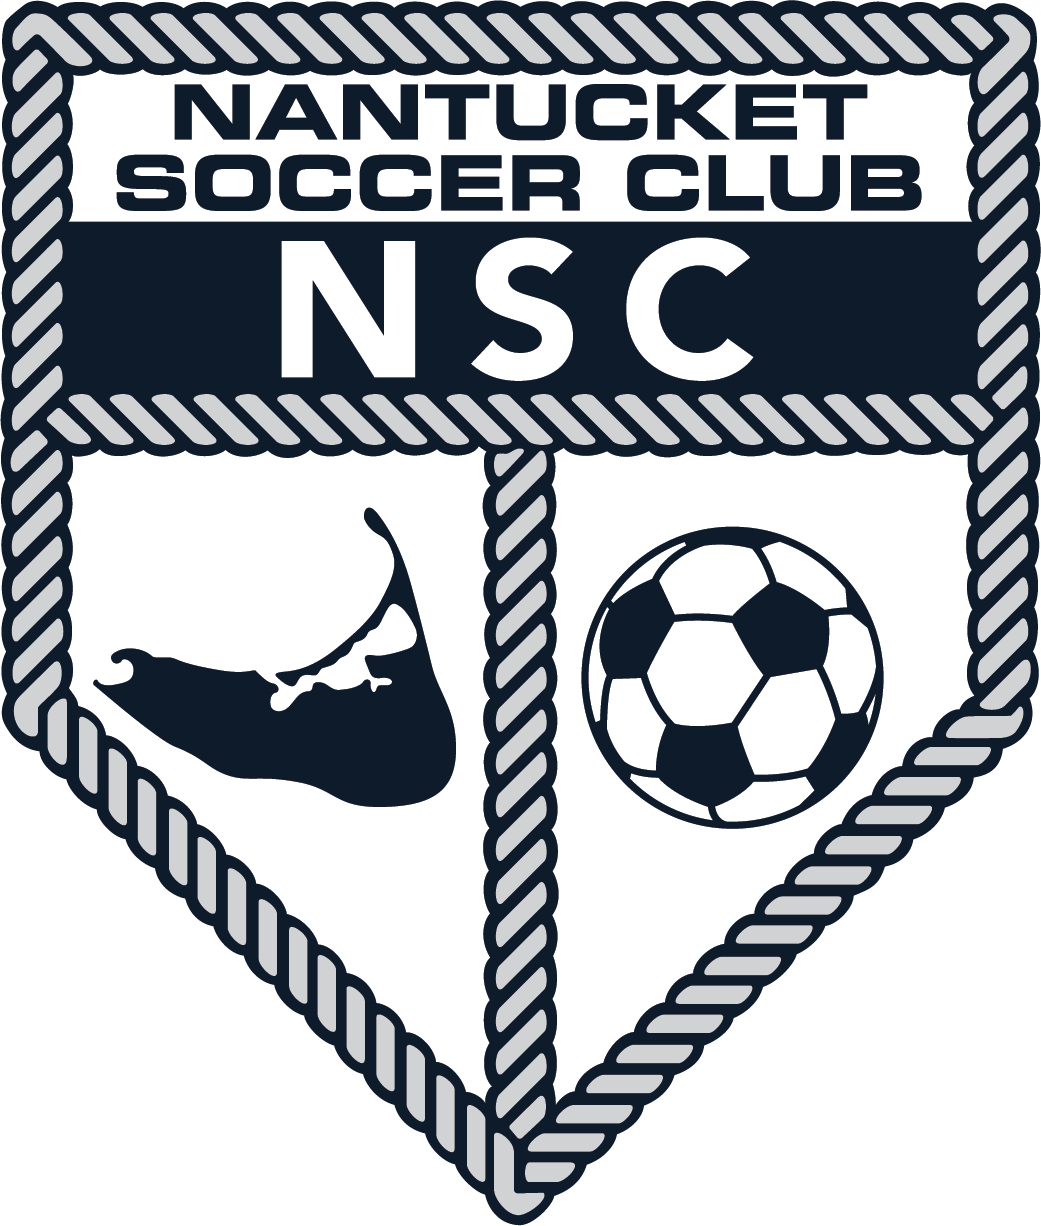 nantucket-soccer